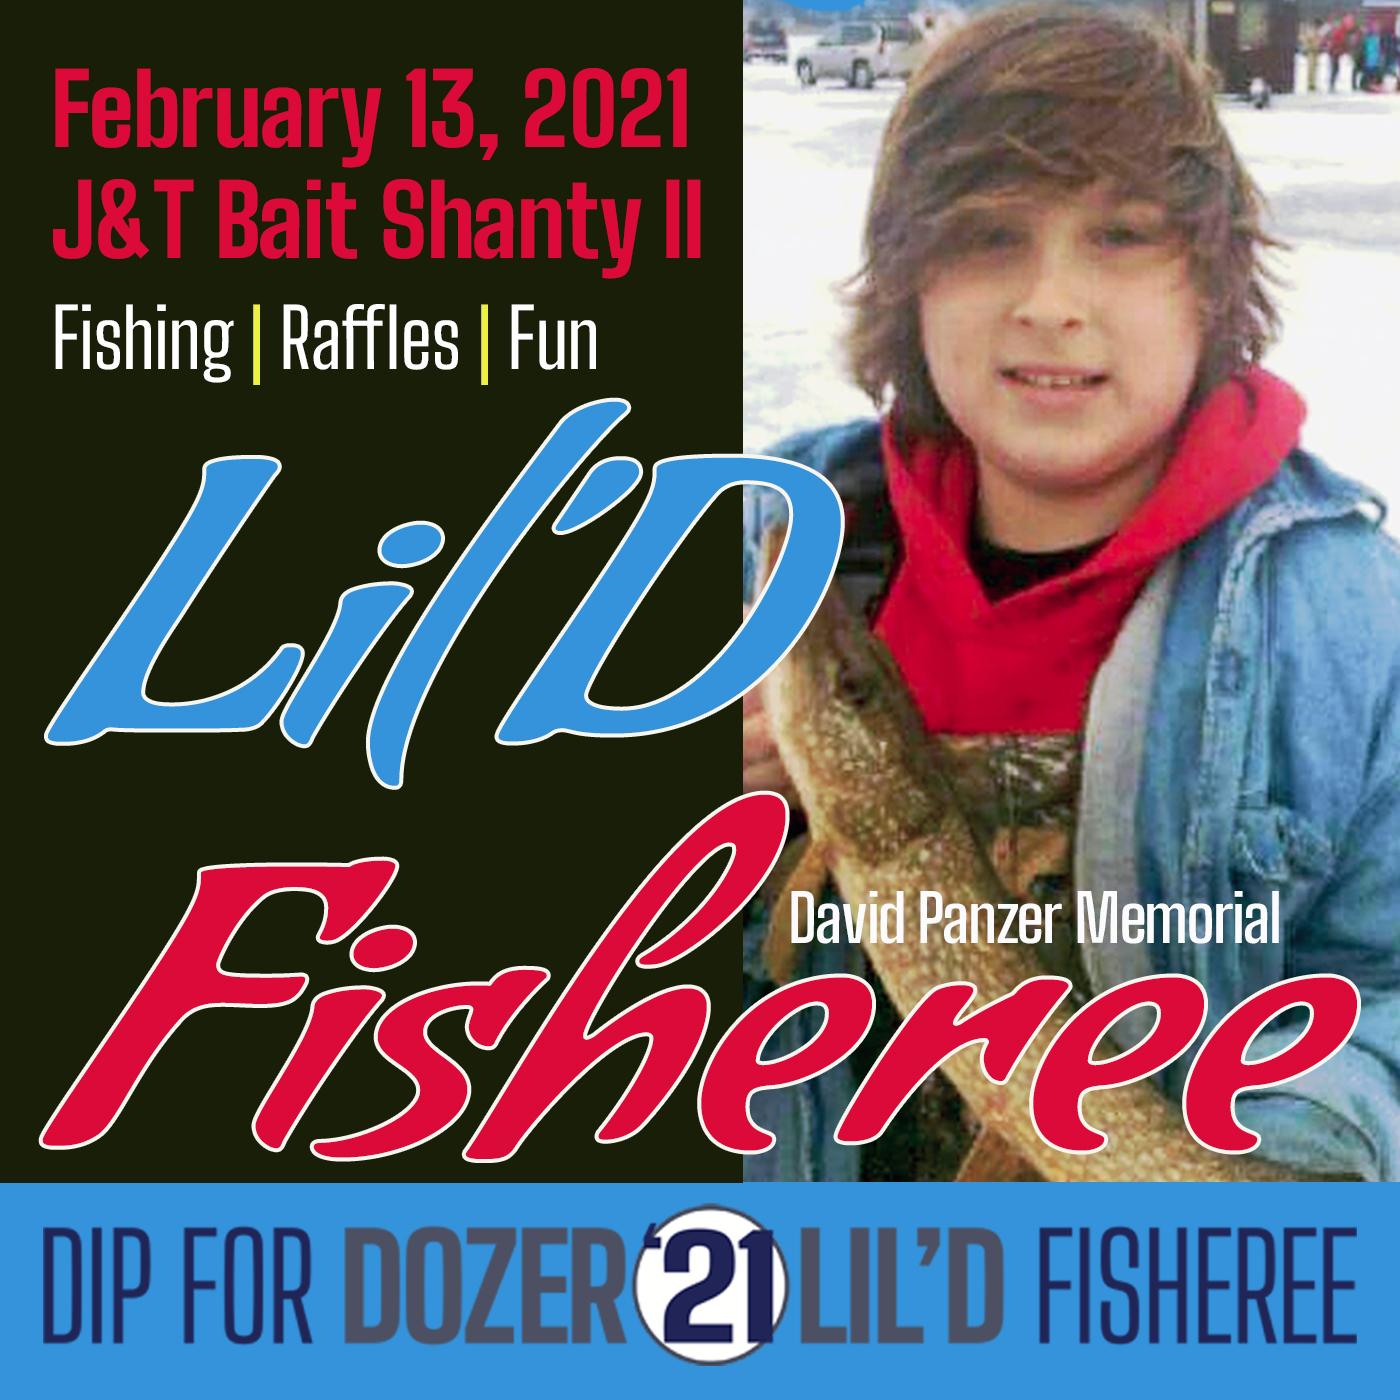 Virtual Dip for Dozer & Lil'D Fisheree